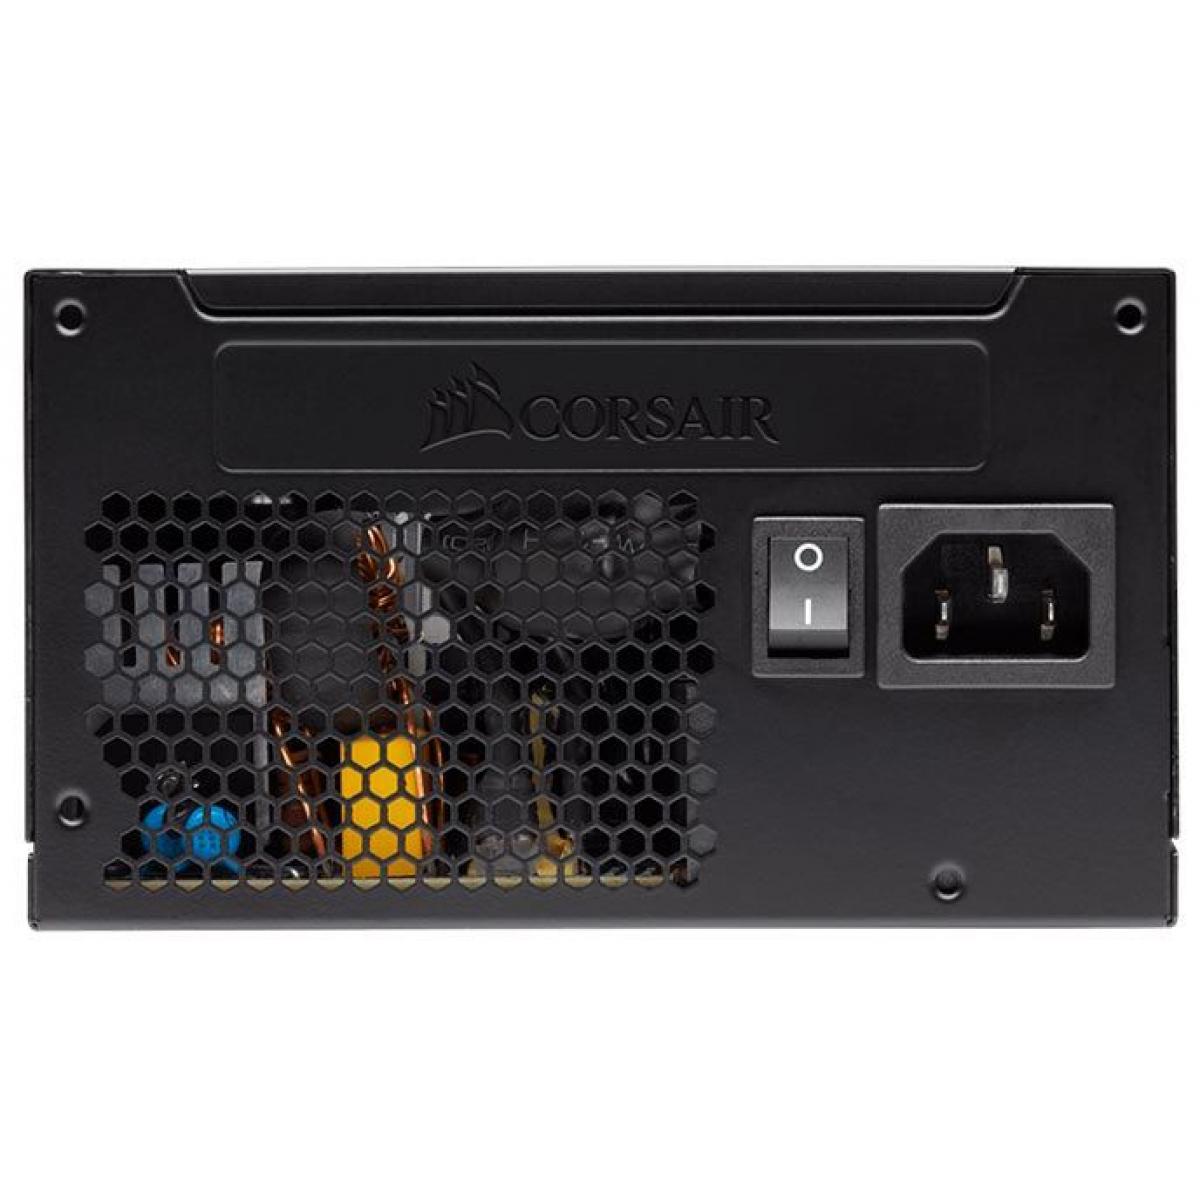 Fonte Corsair VS550 550W, 80 Plus White, PFC Ativo, CP-9020171-BR